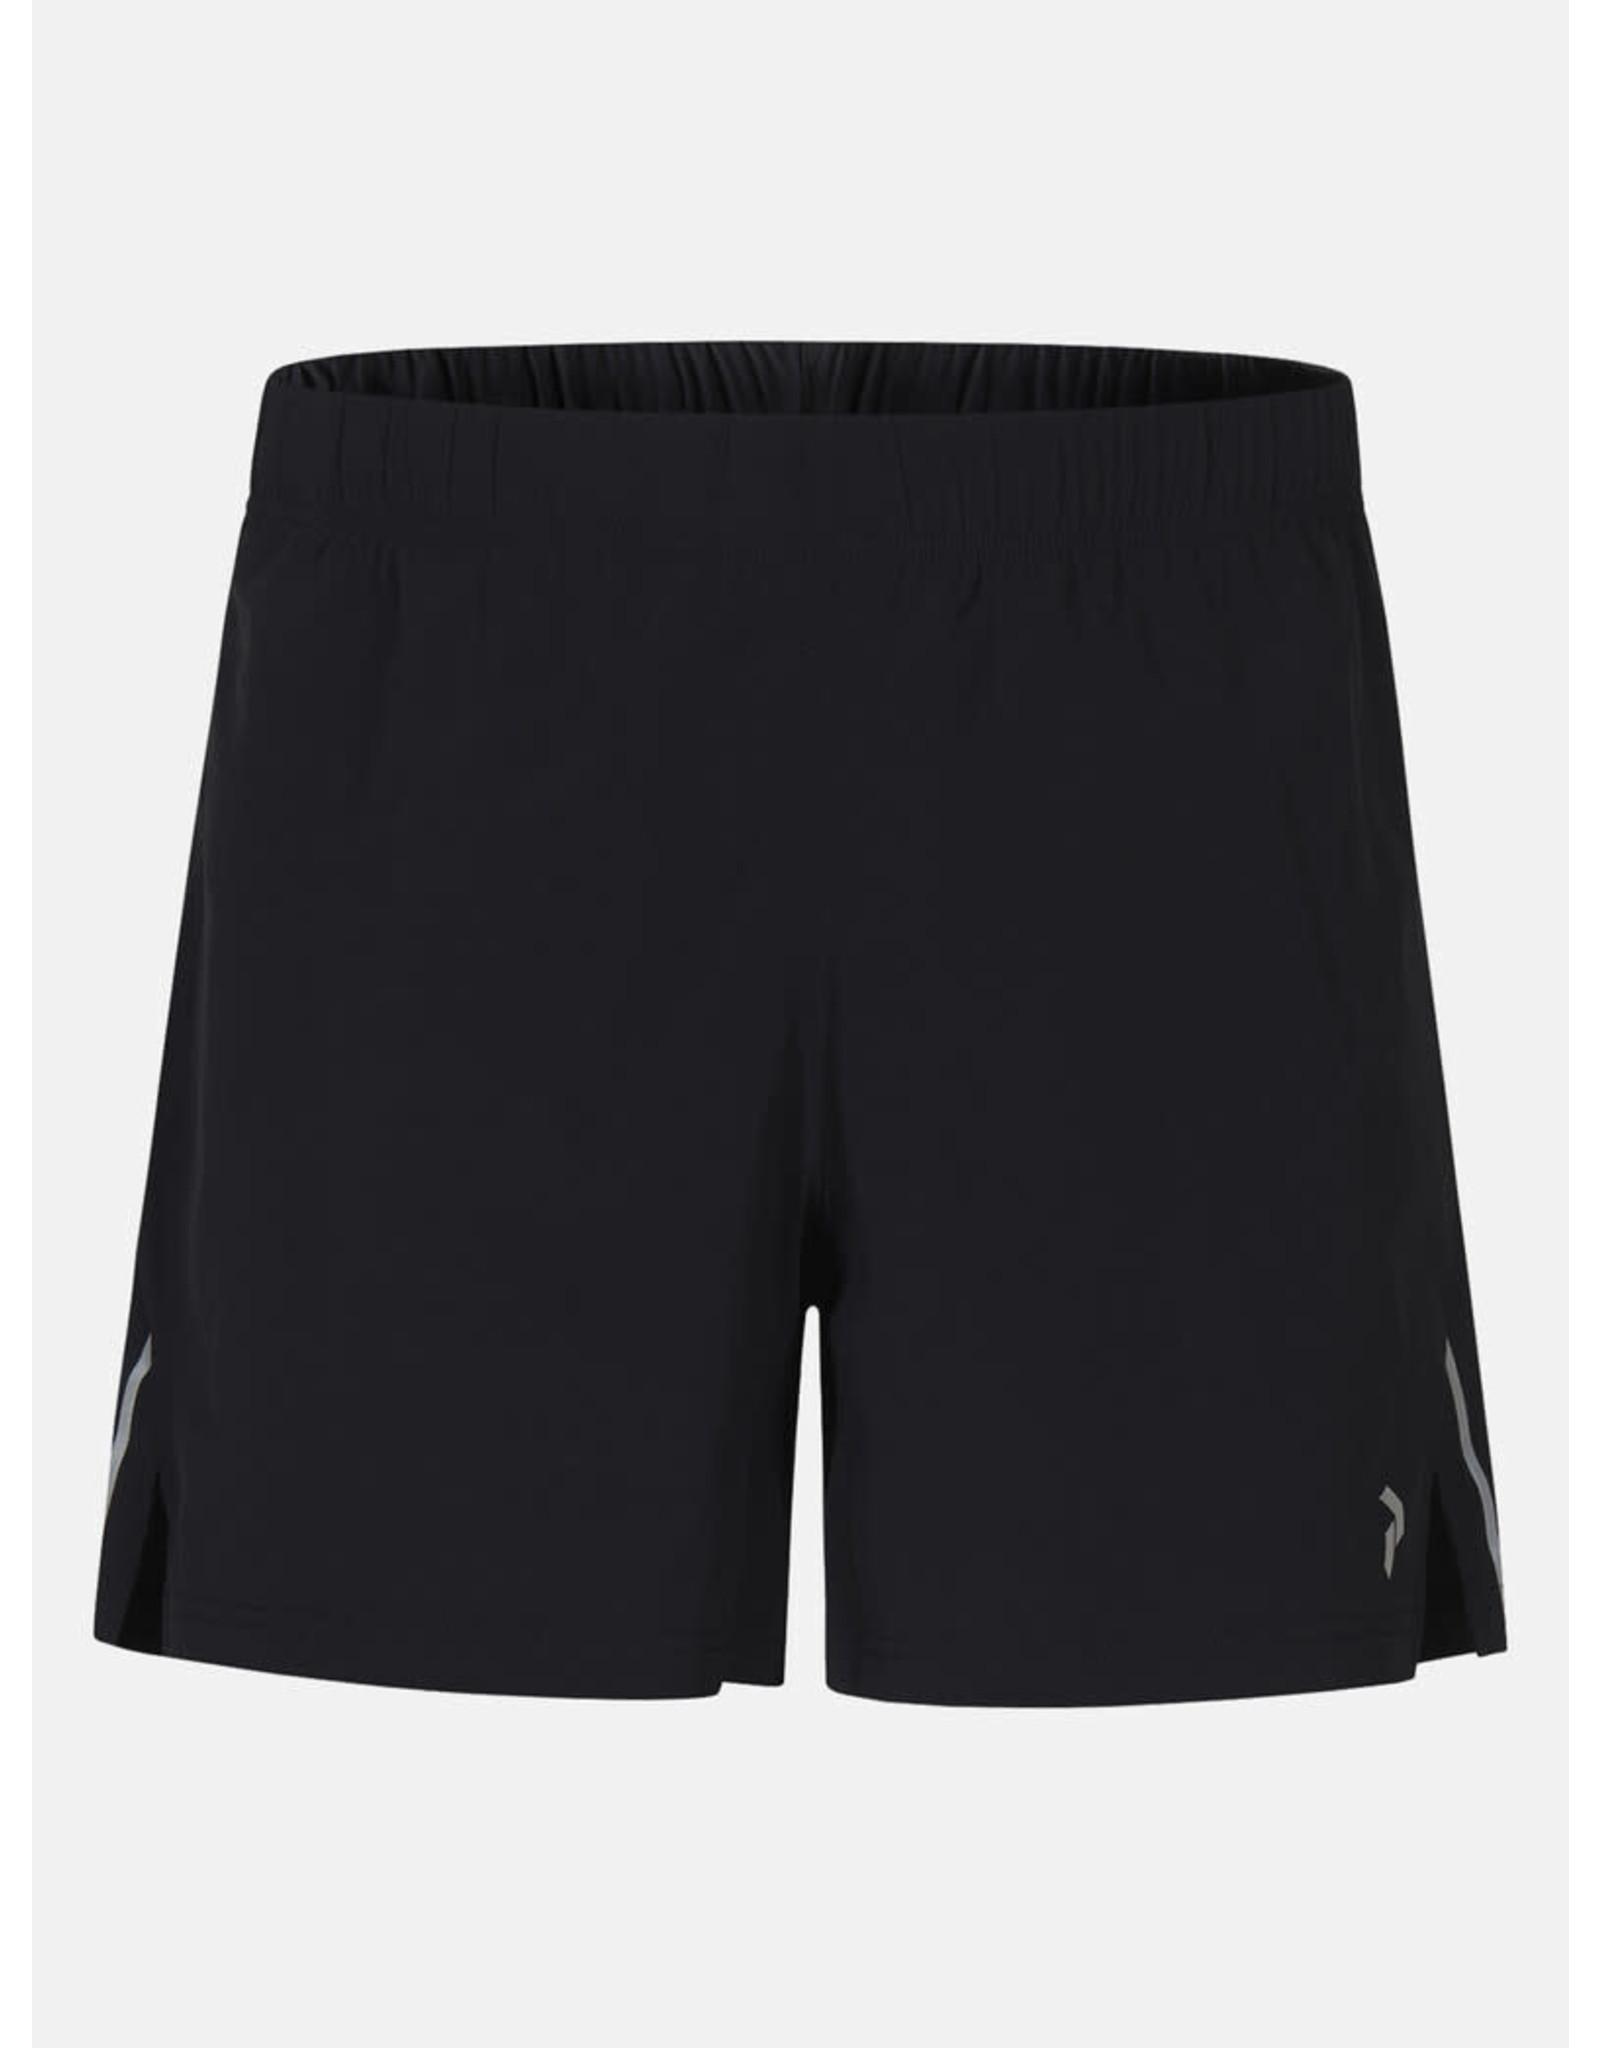 Peak Performance Alum Light Shorts Men